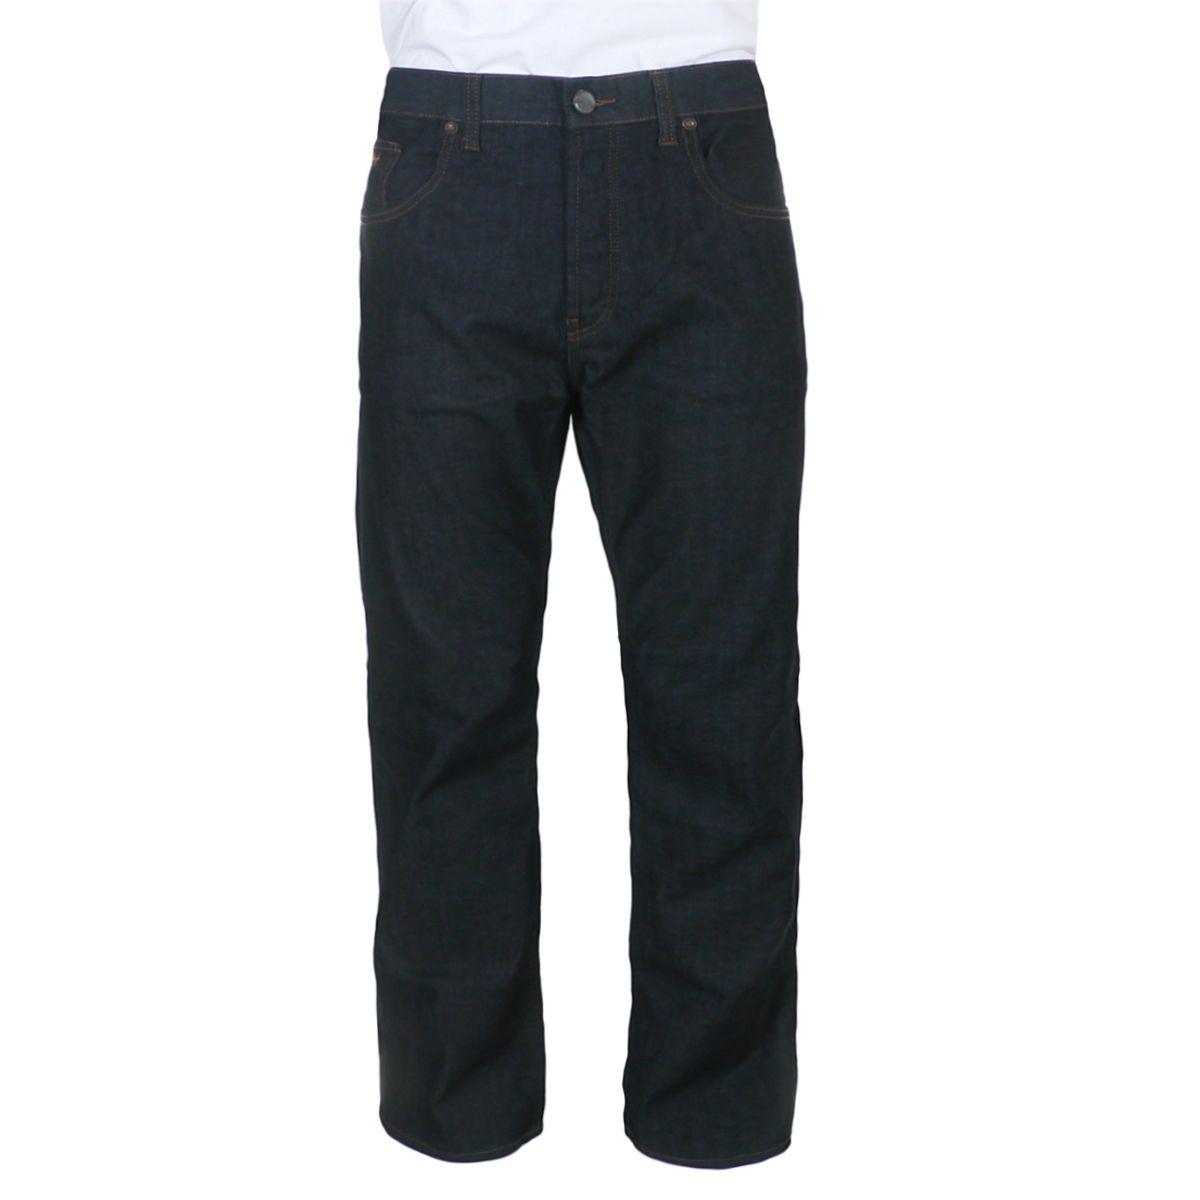 jeans bleu fonc pour homme fort du 40us au 50us. Black Bedroom Furniture Sets. Home Design Ideas